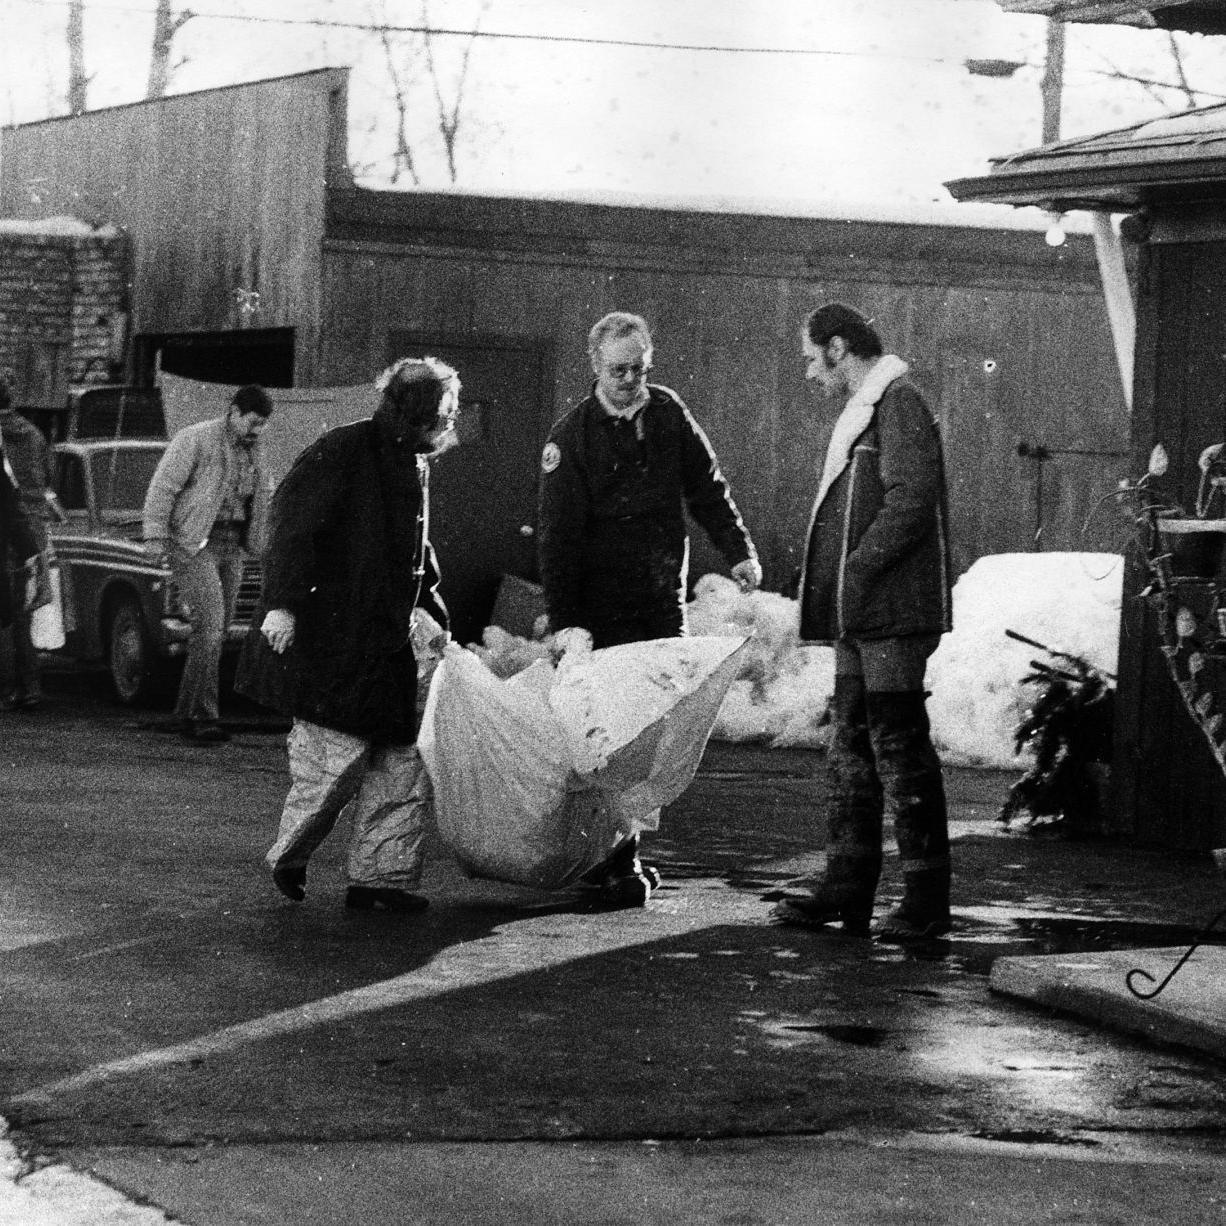 John Wayne Gacy was arrested 40 years ago in a killing spree